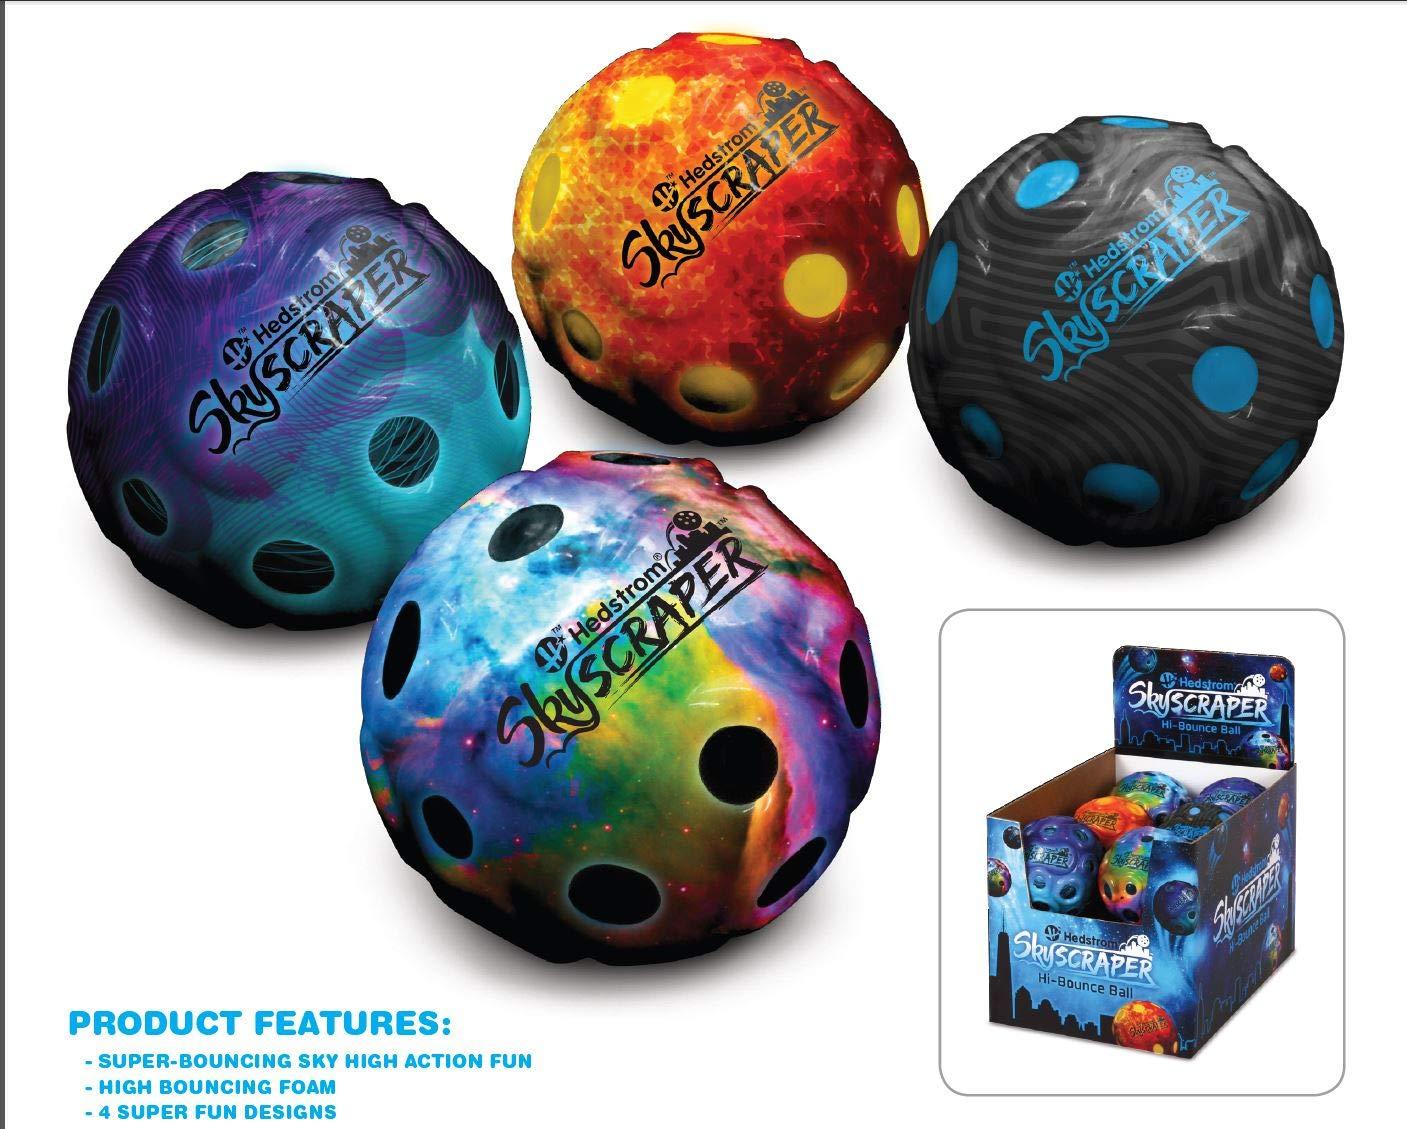 Hedstrom Skyscraper High Bounce Balls Pack of 12 68 mm 53-4040PDQAZ Assorted Designs